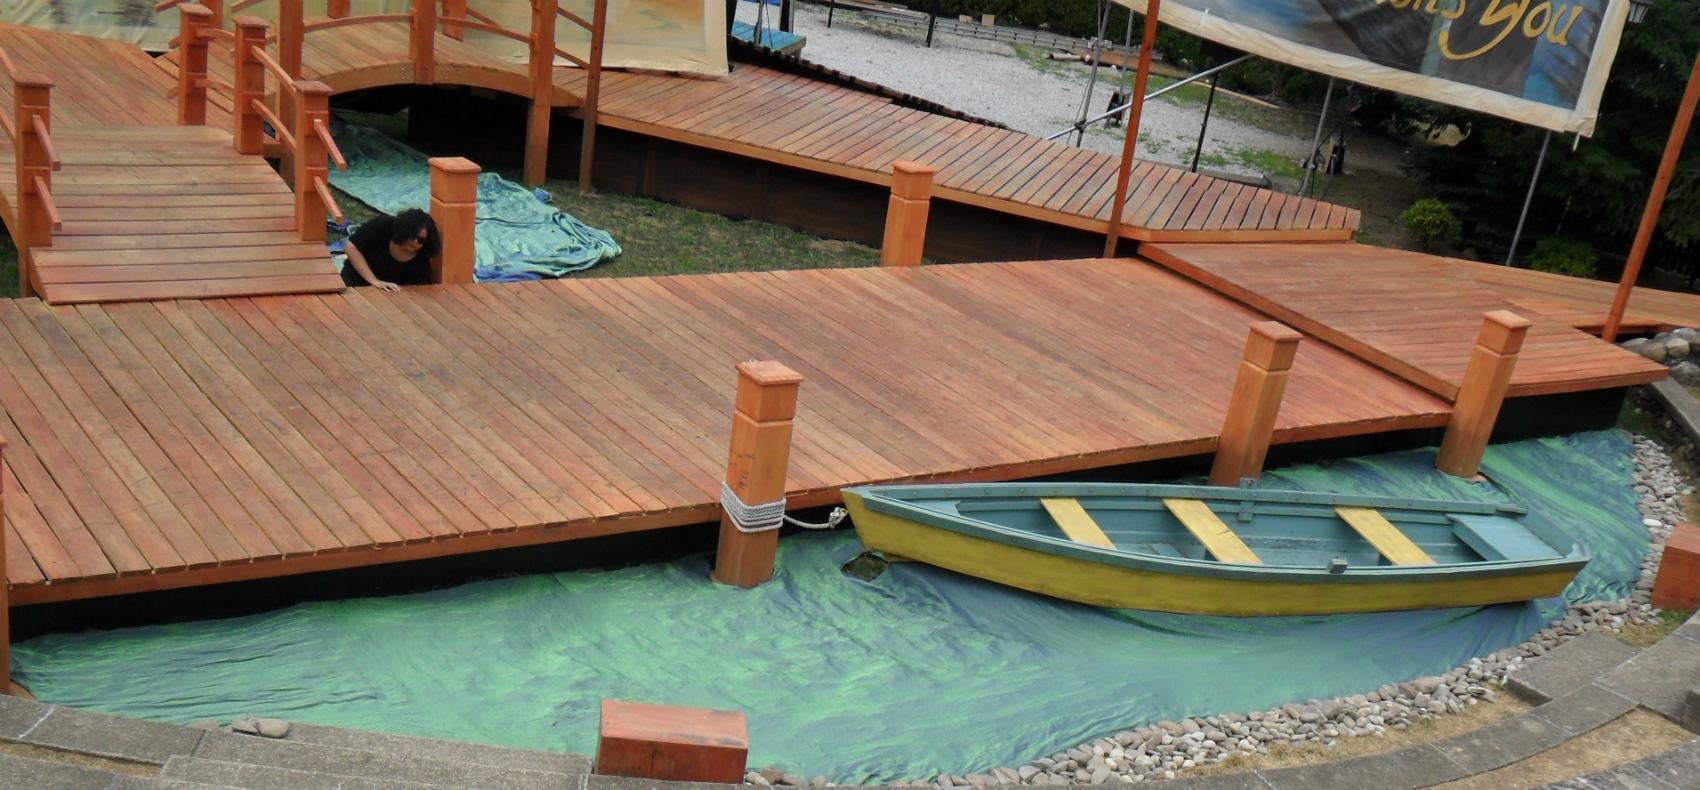 Tewksbury Arts - Boat with Water Fabric